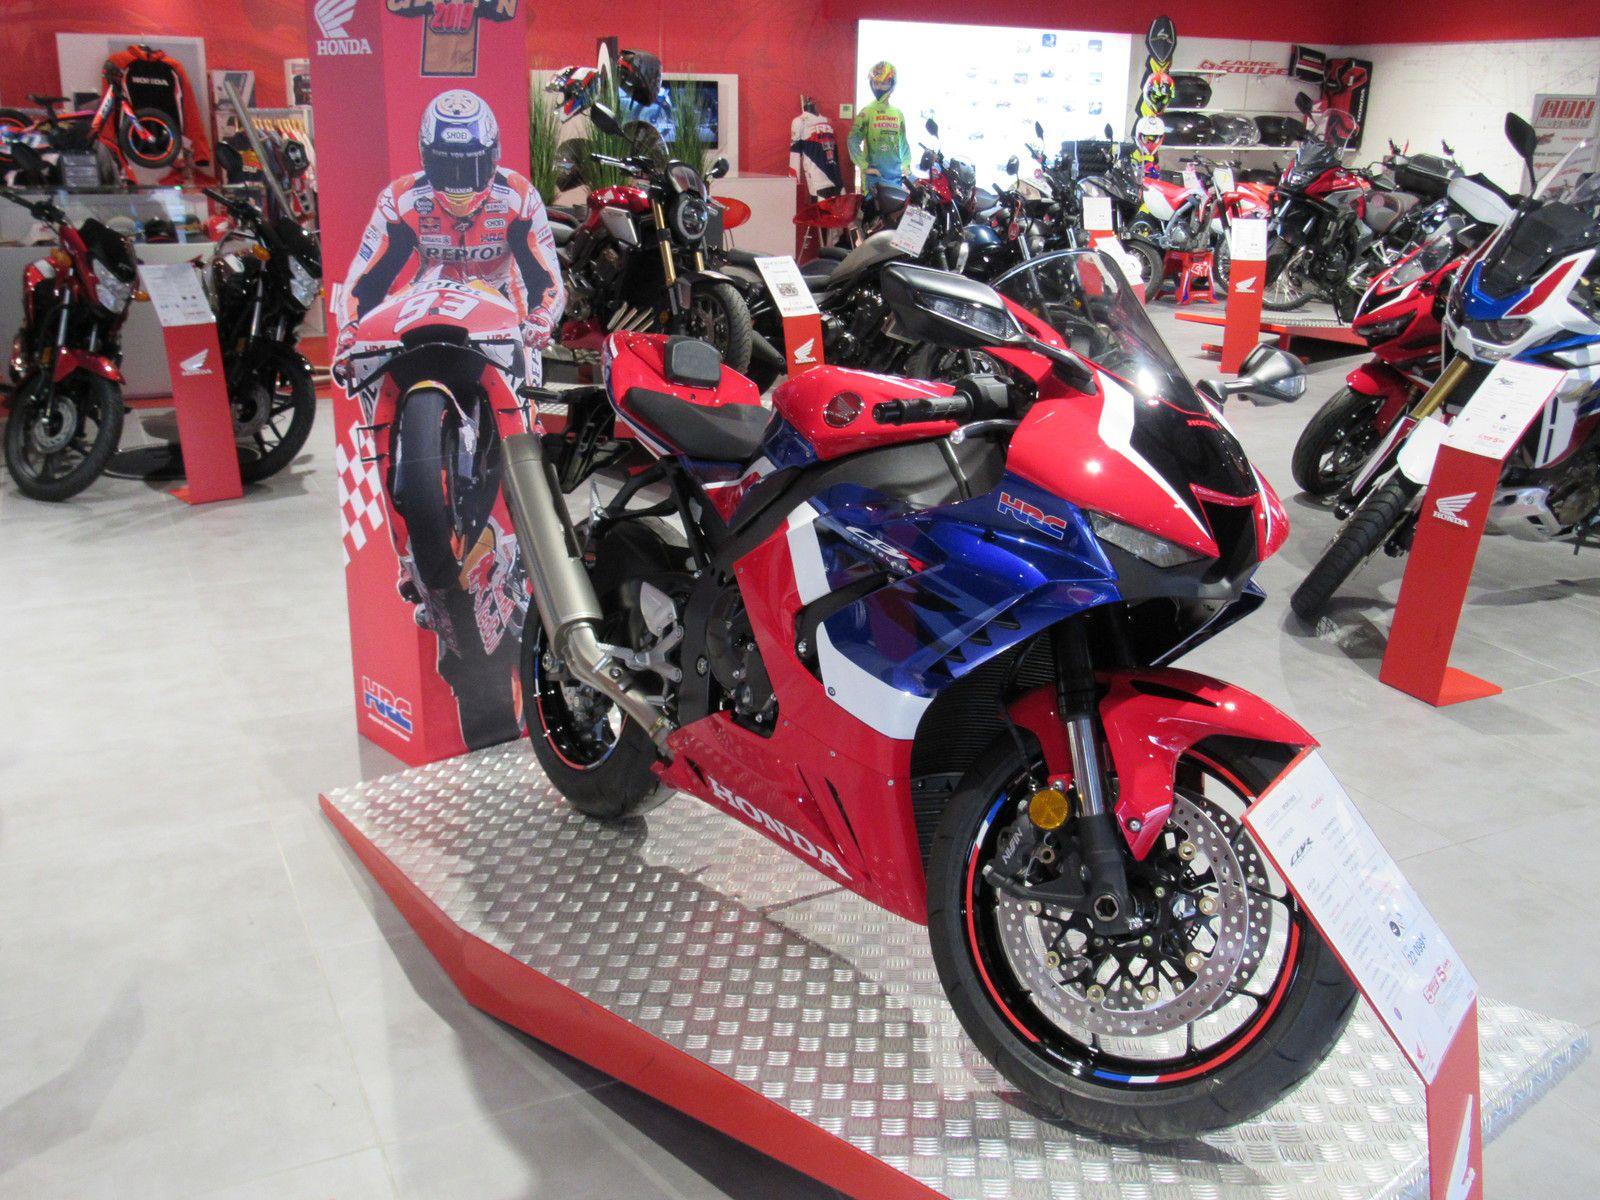 moto sportive chez honda la cbr1000rr-r coloris hrc chez mon partenaire (adnmoto30)